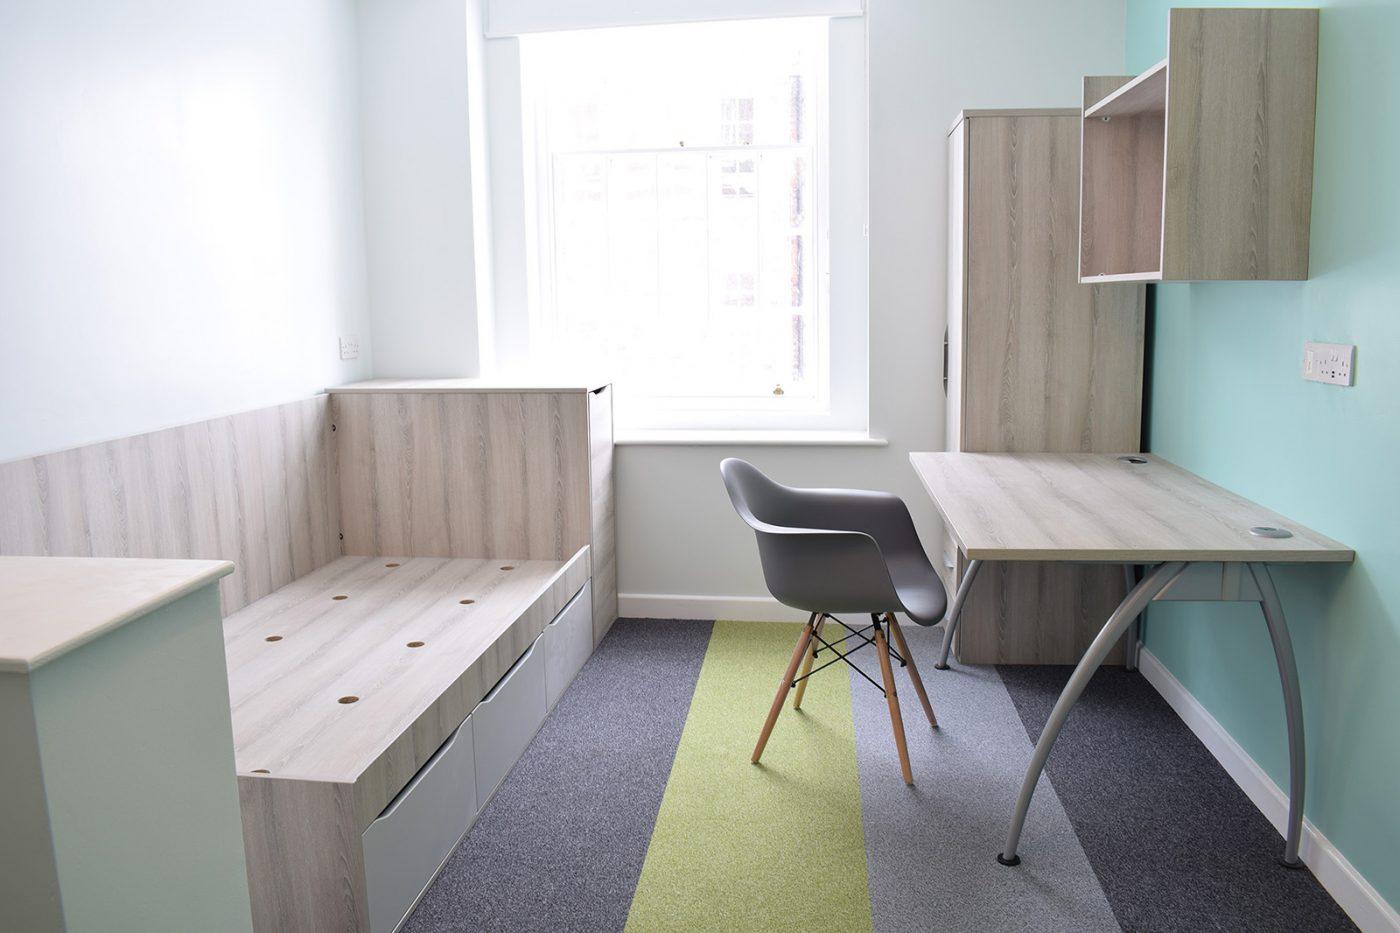 student accommodation furniture, bedroom furniture, student bedroom